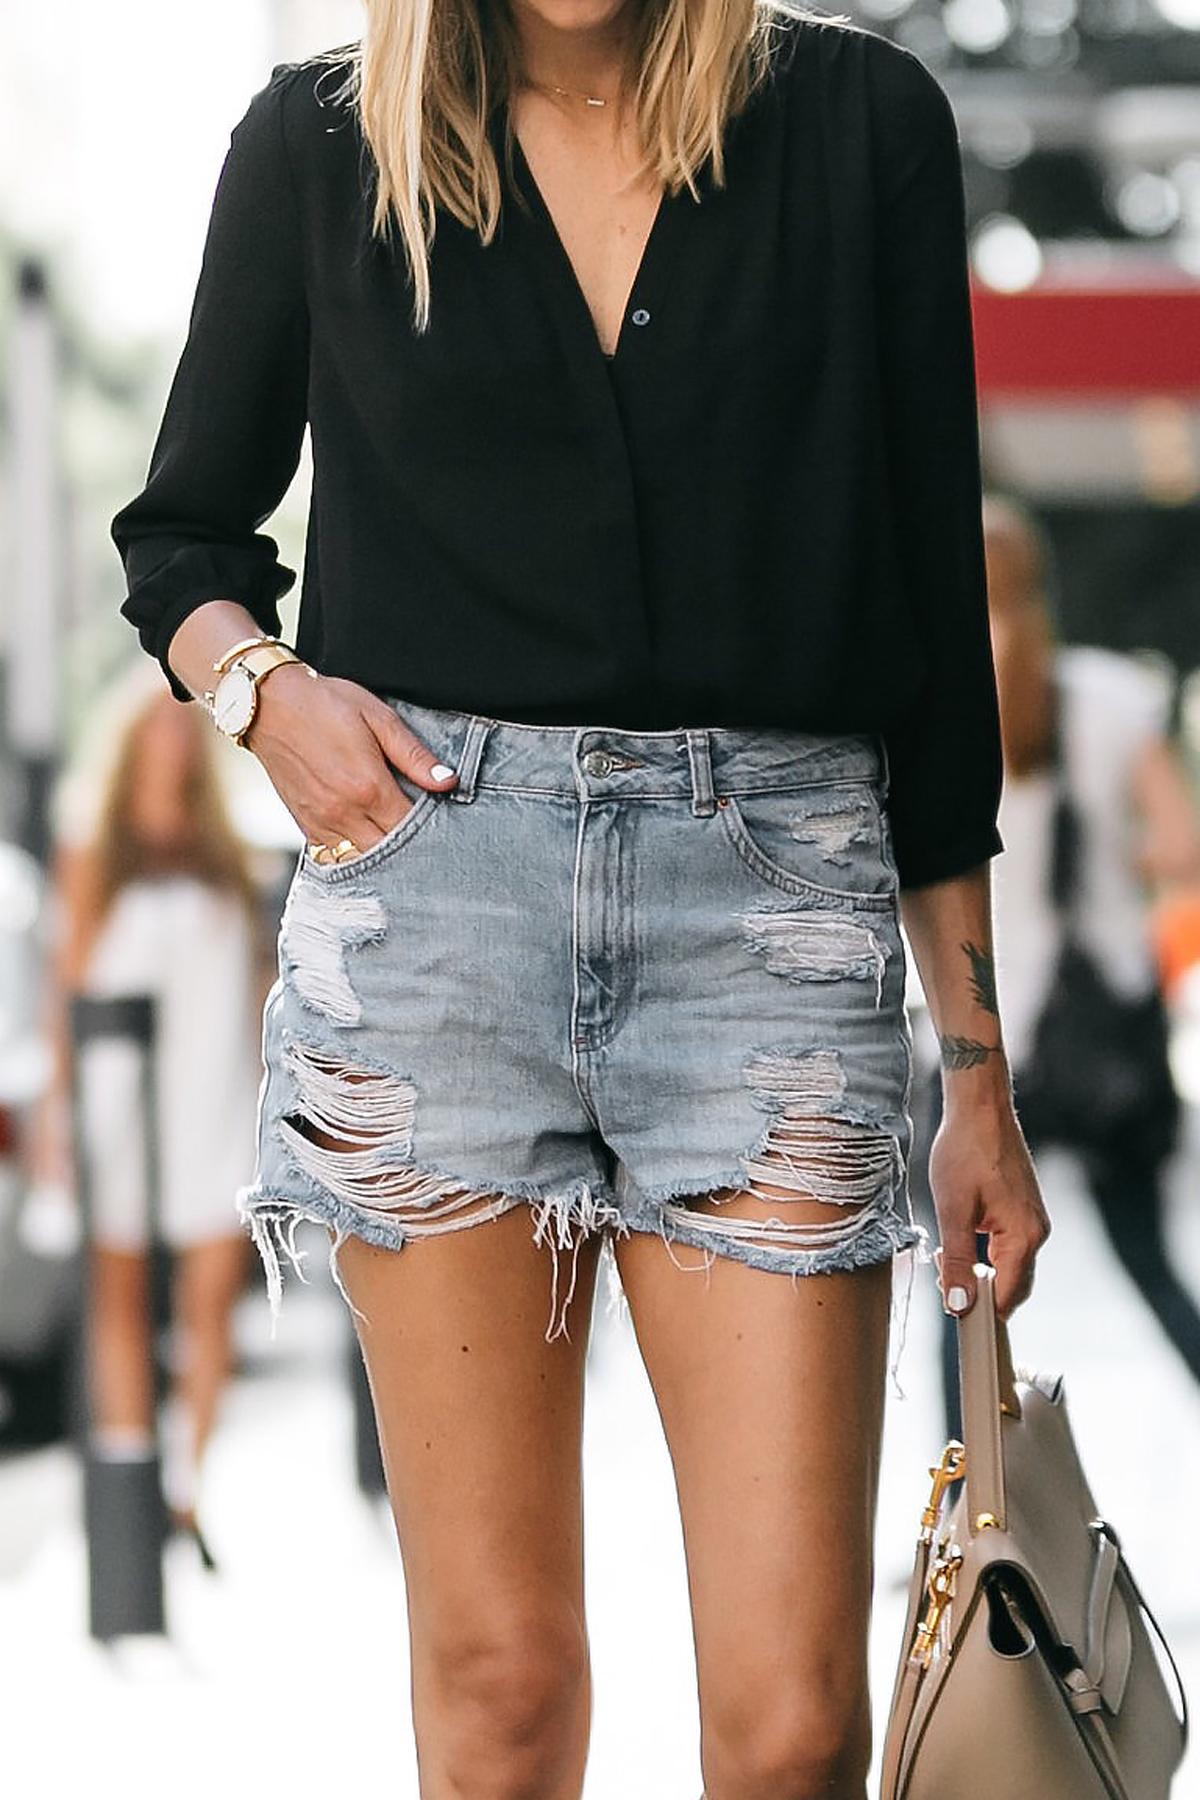 Nodstrom Black Long Sleeve Button Down Blouse Topshop Denim Ripped Mom Shorts Outfit Celine Belt Bag Fashion Jackson Dallas Blogger Fashion Blogger Street Style